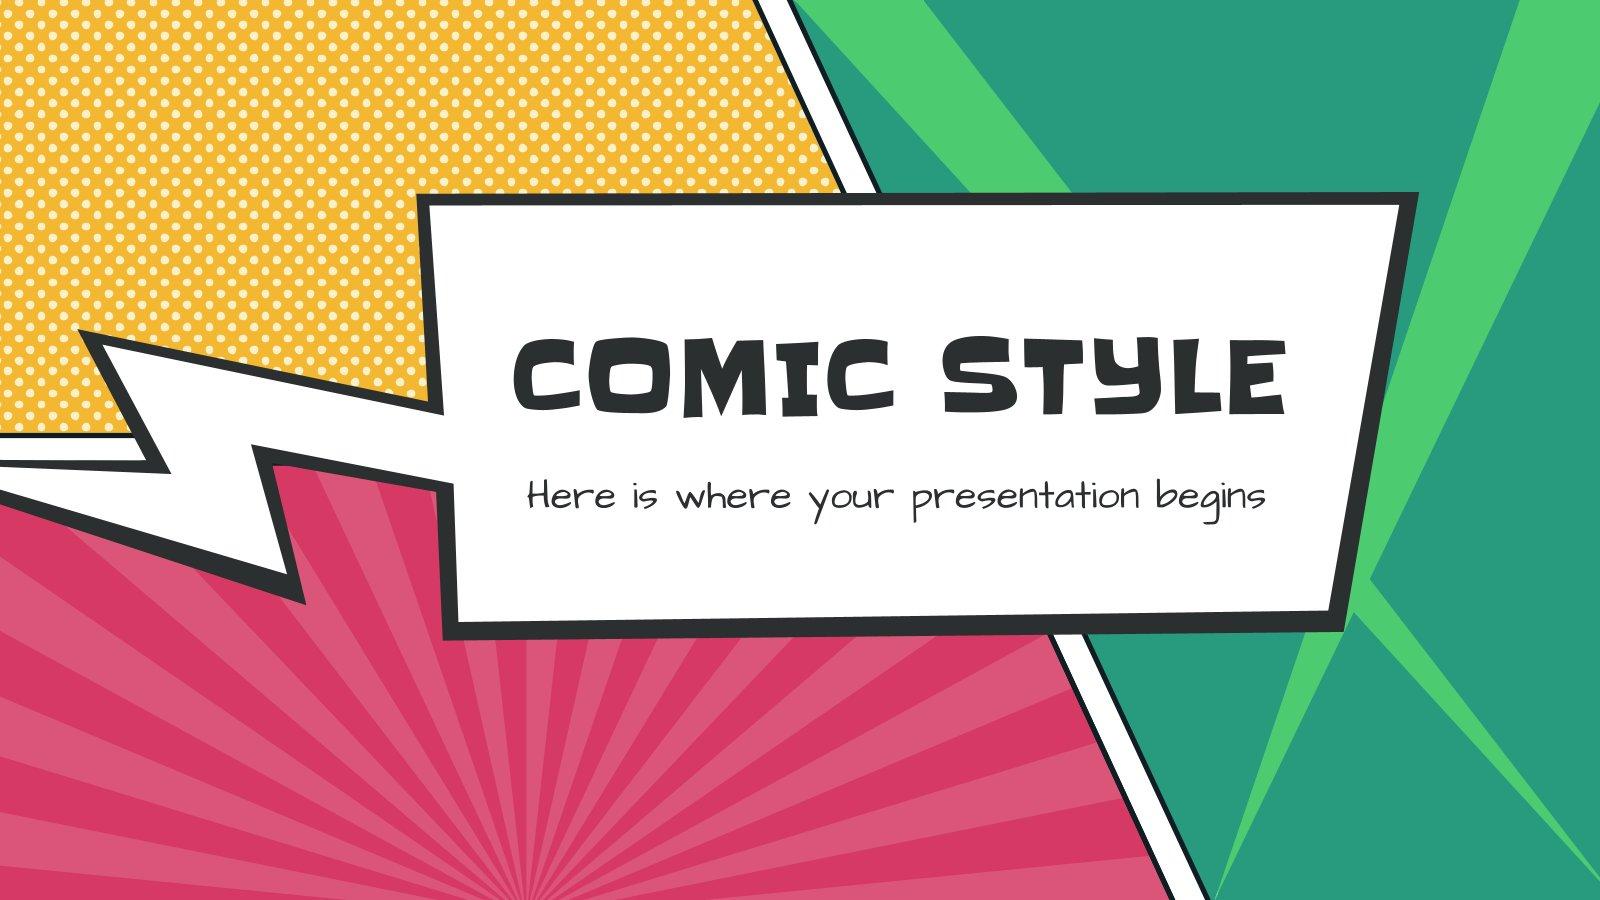 Comic Style presentation template